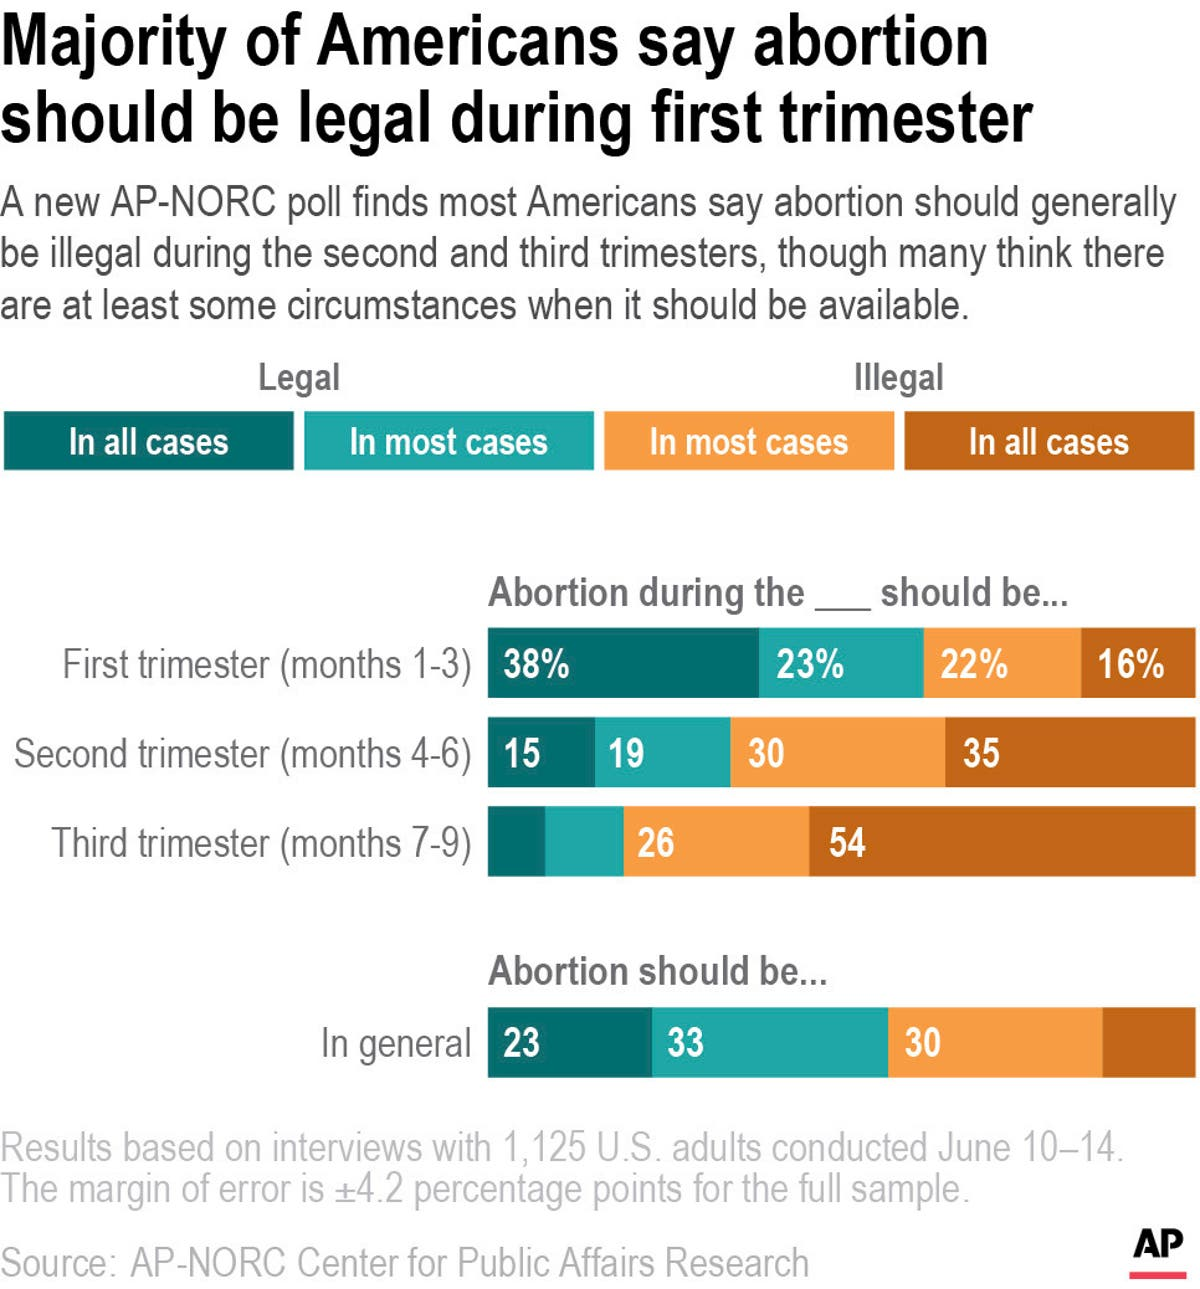 AP-NORC世論調査: ほとんどの人が妊娠中絶を制限すると言います